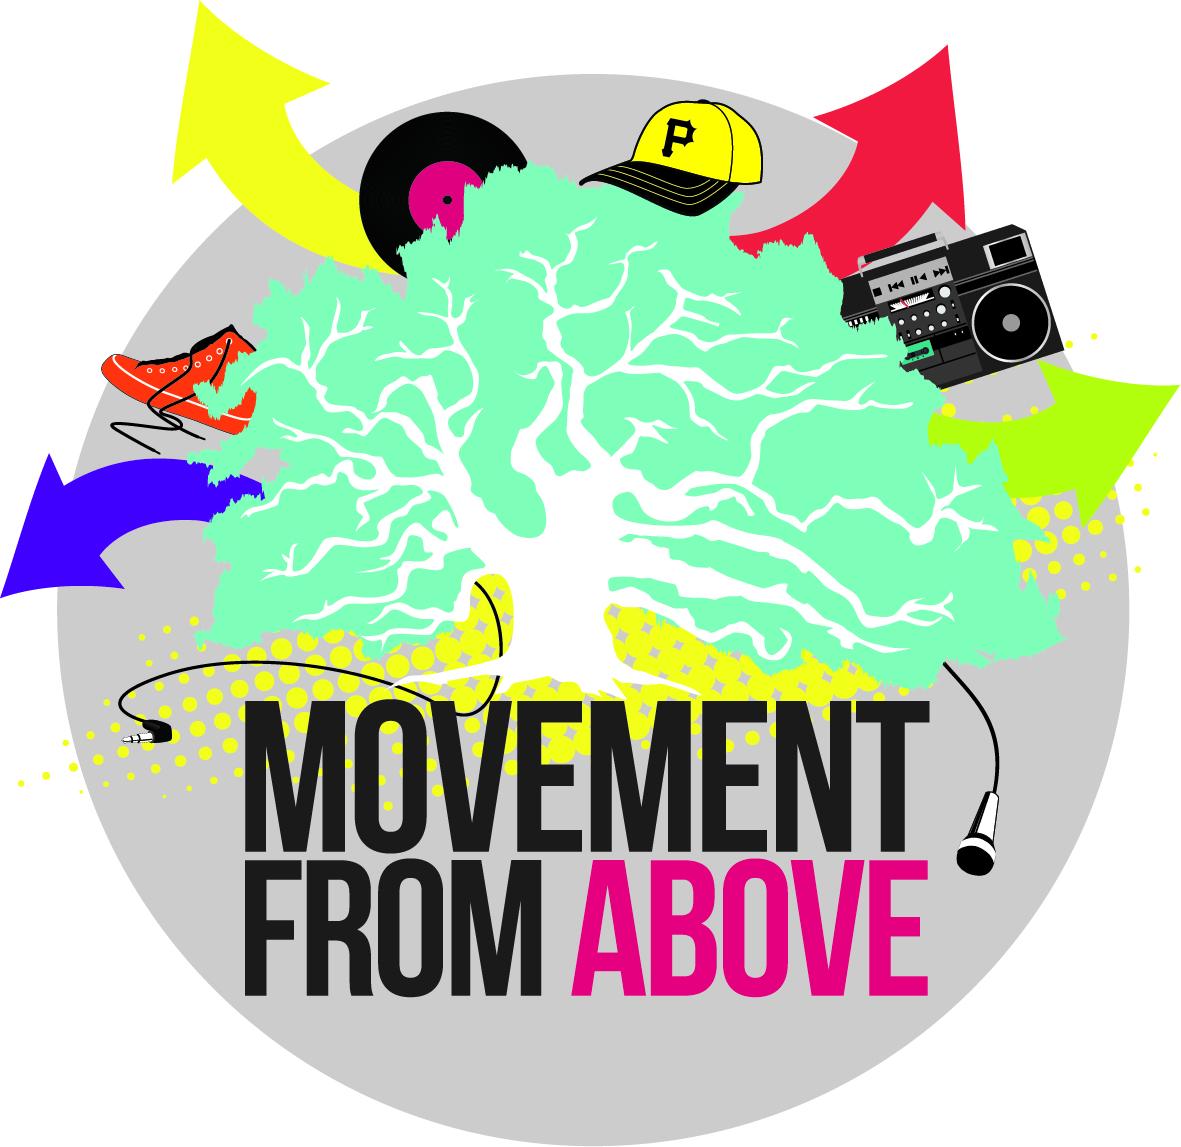 movementfromabove.jpg